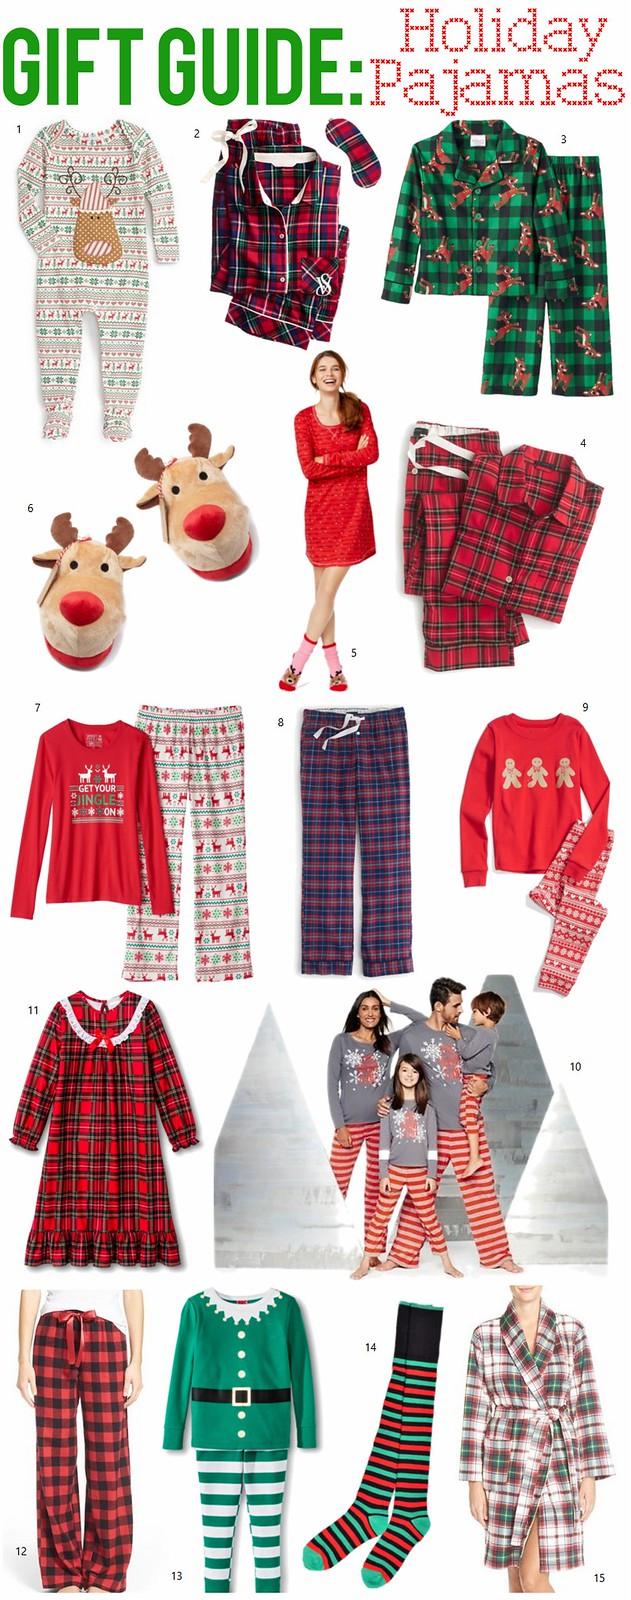 Gift Guide: Holiday Pajamas | Christmas Shopping